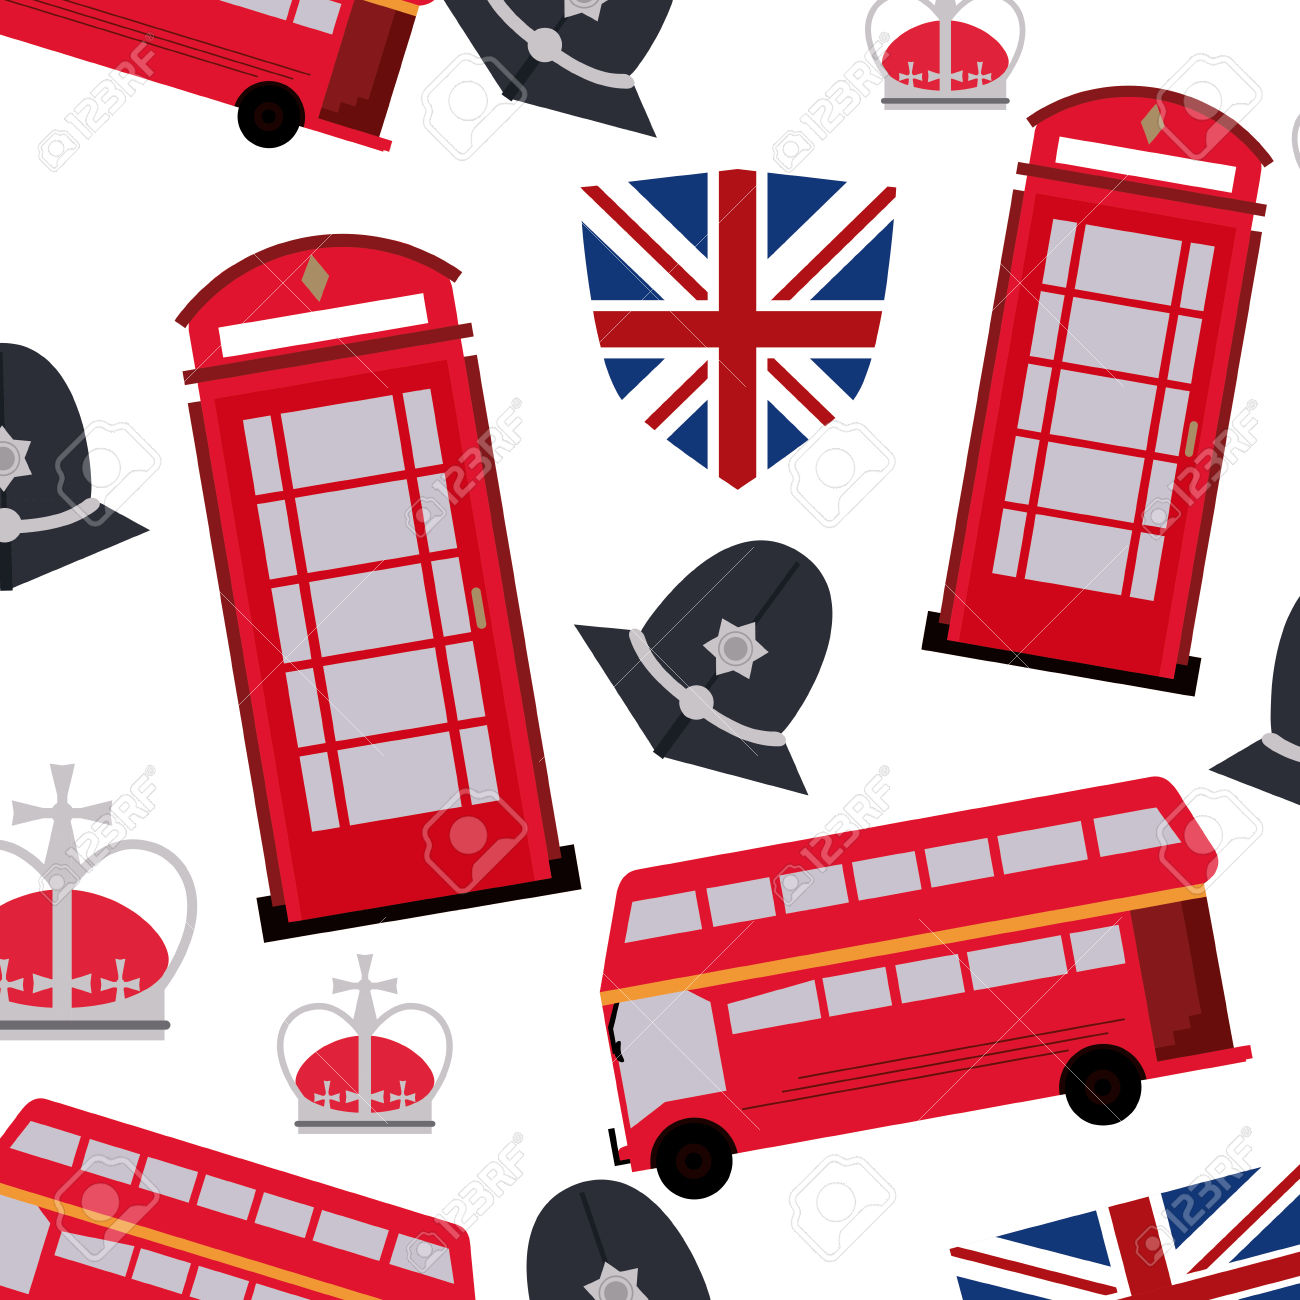 United kingdom clipart freeuse stock 1,215 Clipart The United Kingdom Stock Illustrations, Cliparts And ... freeuse stock